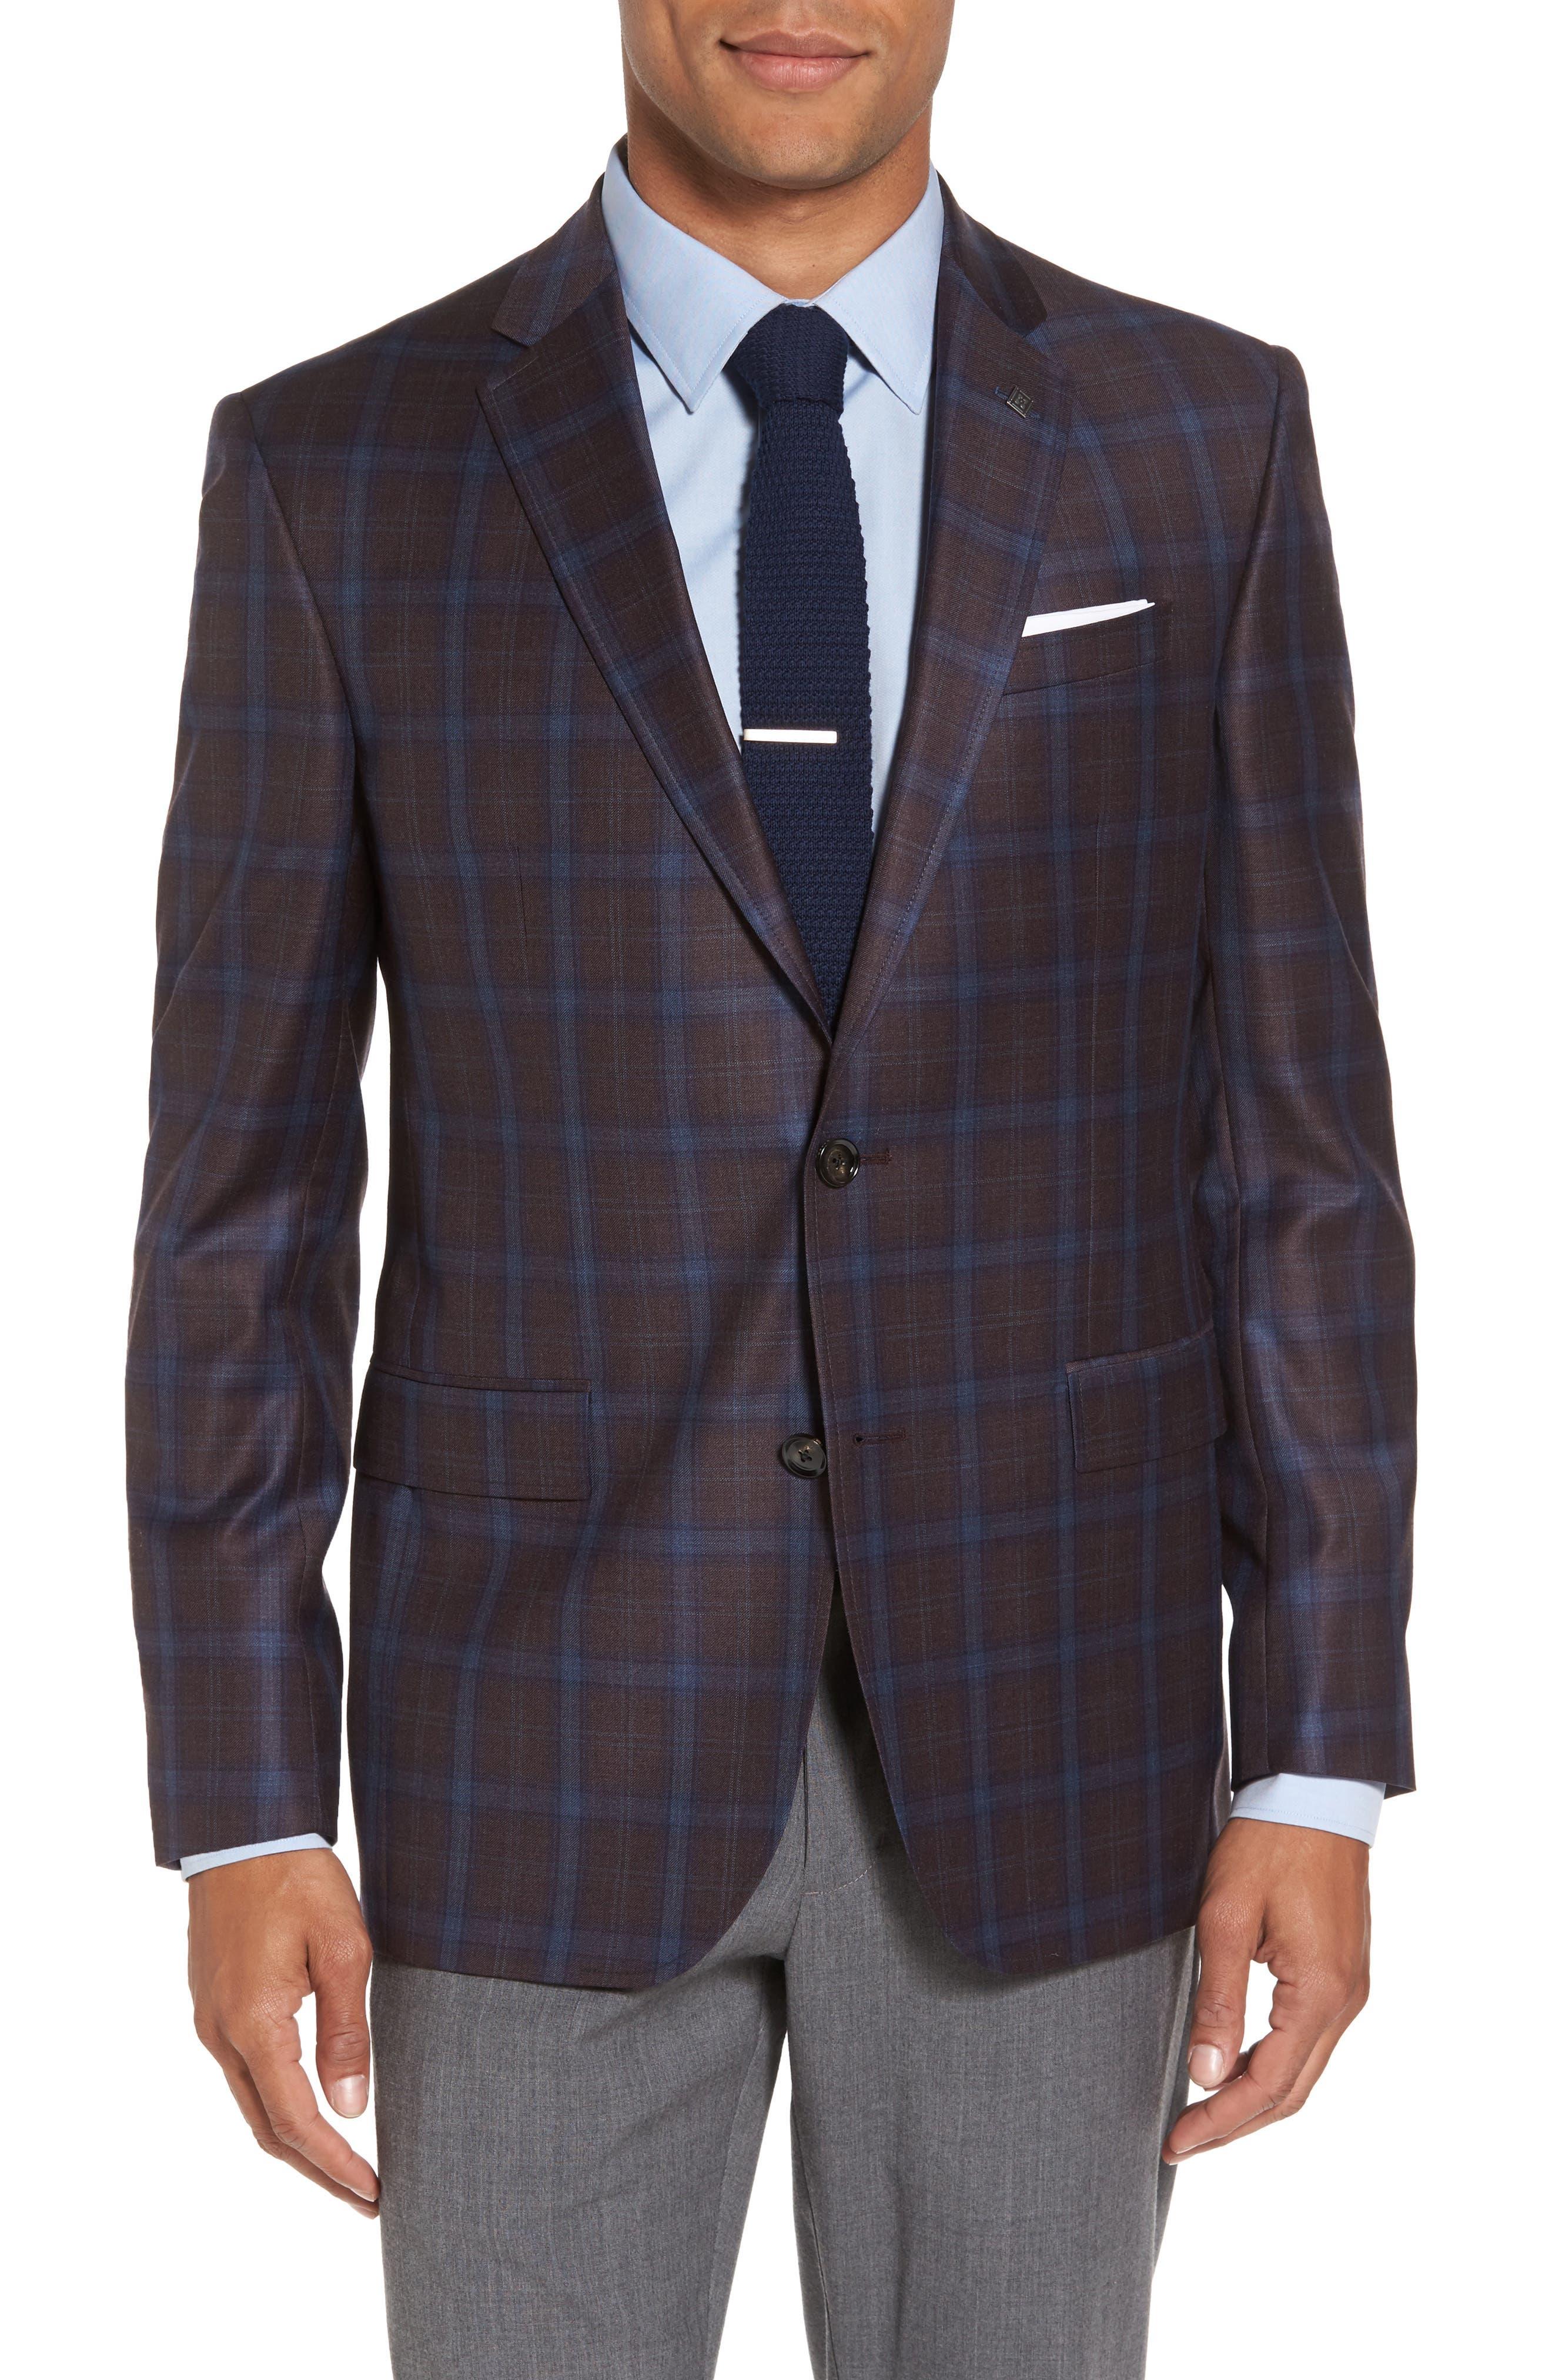 Jay Trim Fit Plaid Wool Sport Coat,                         Main,                         color, 932